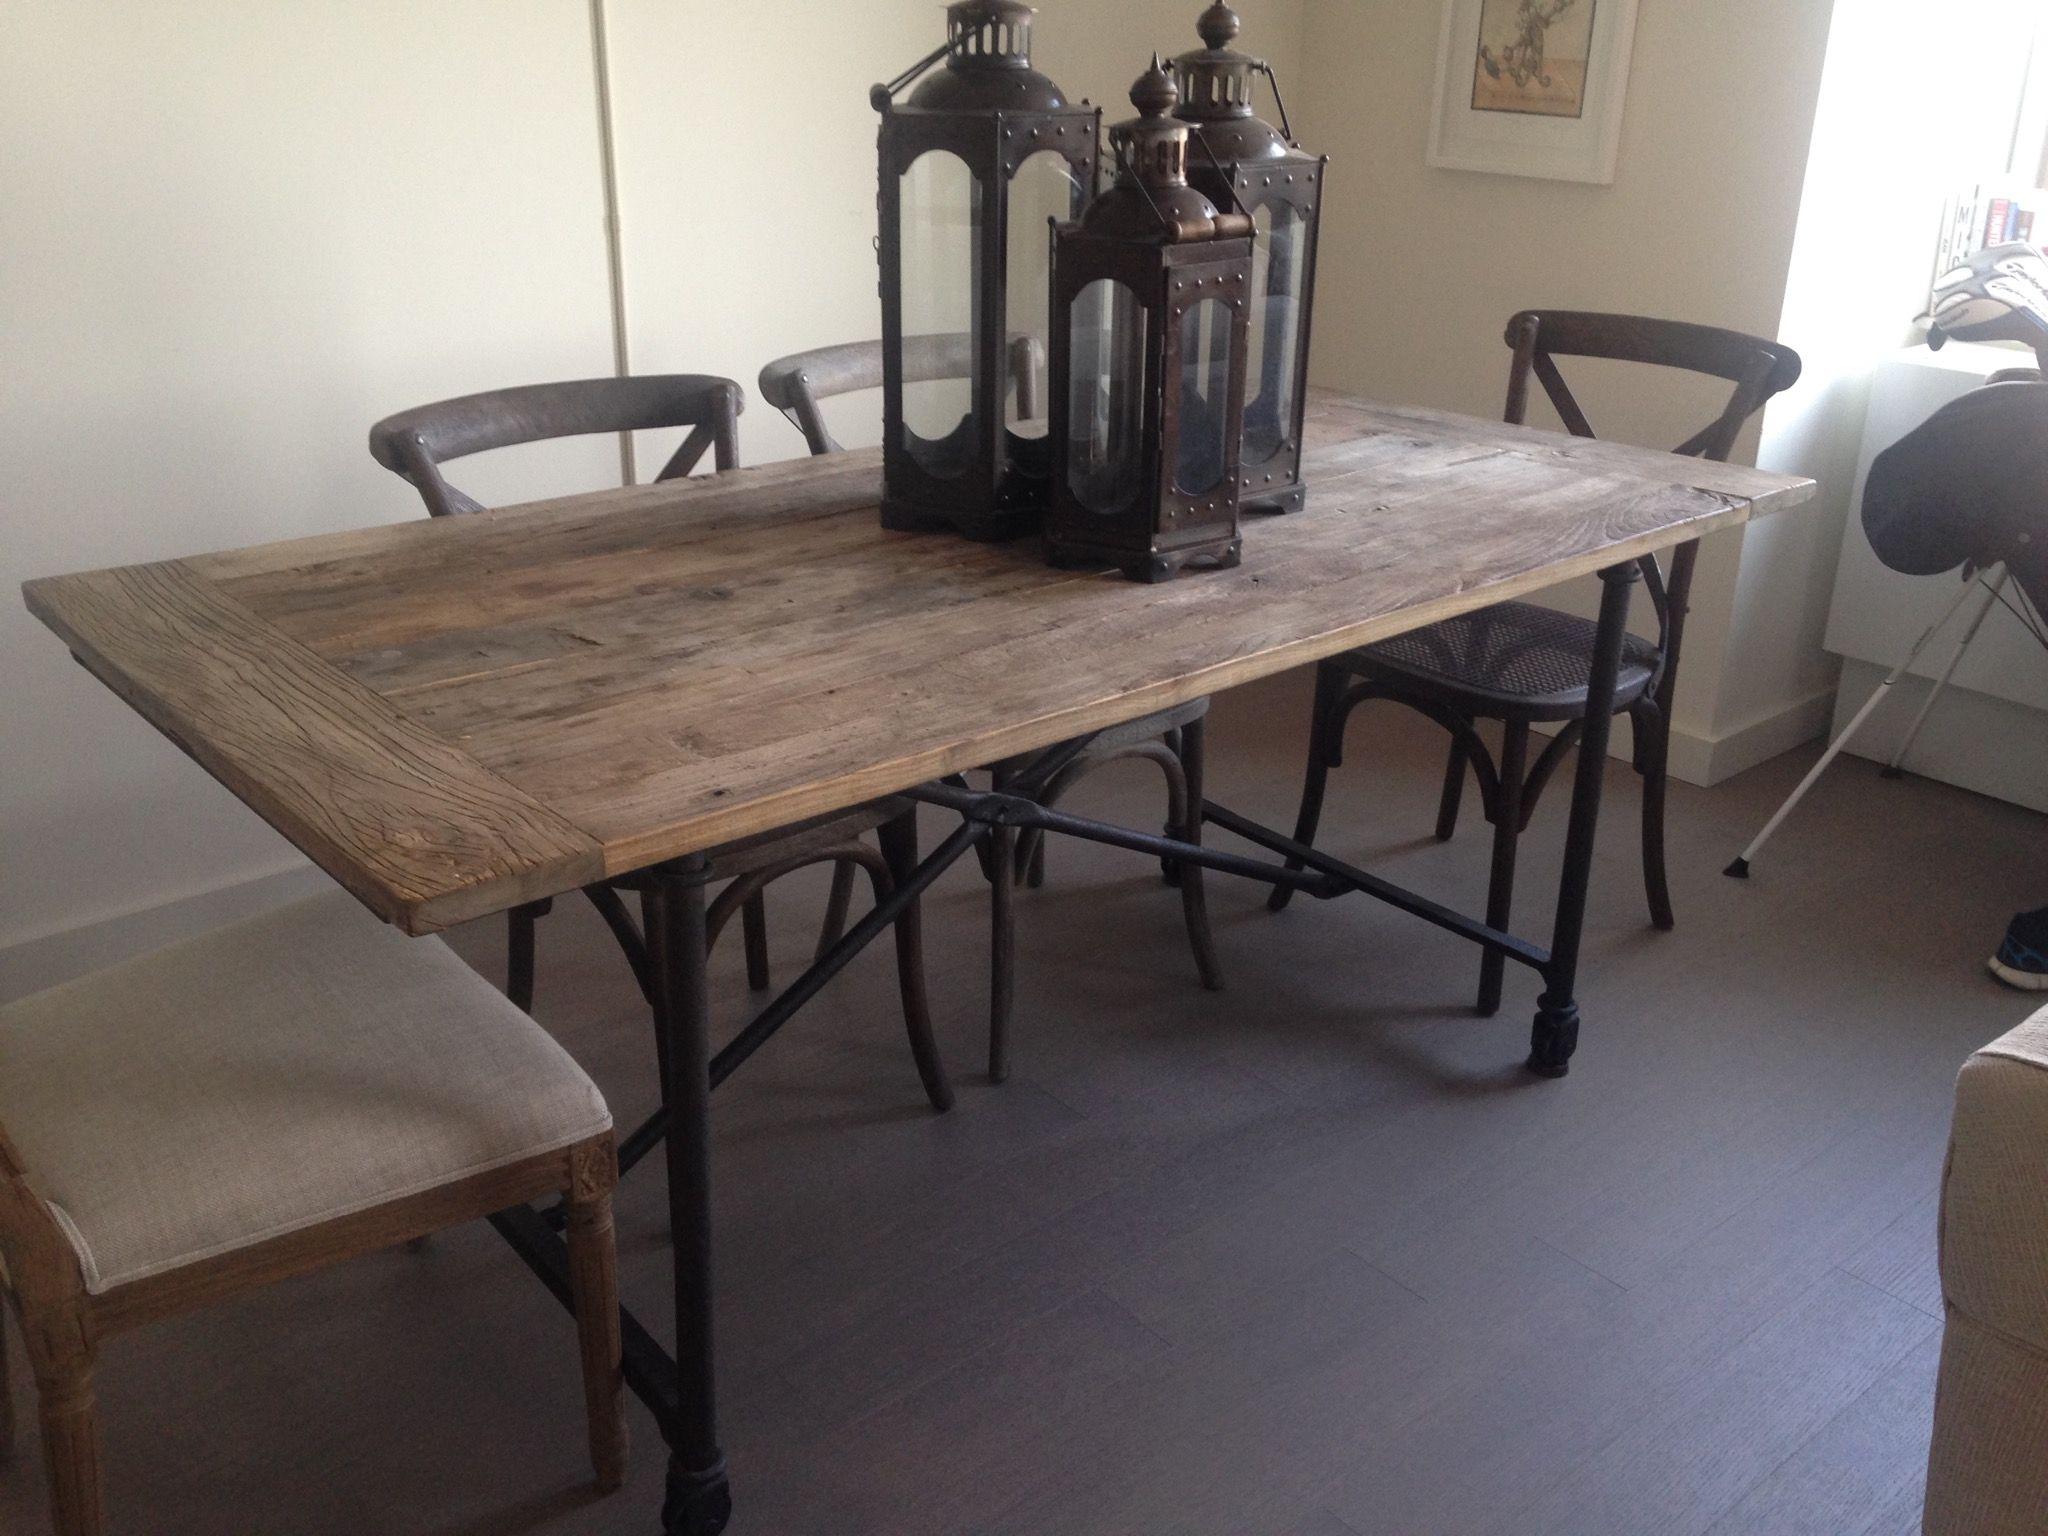 460 Restoration Hardware Flatiron Table Originally Paid 745 Tax  # Restoration Hardware Muebles